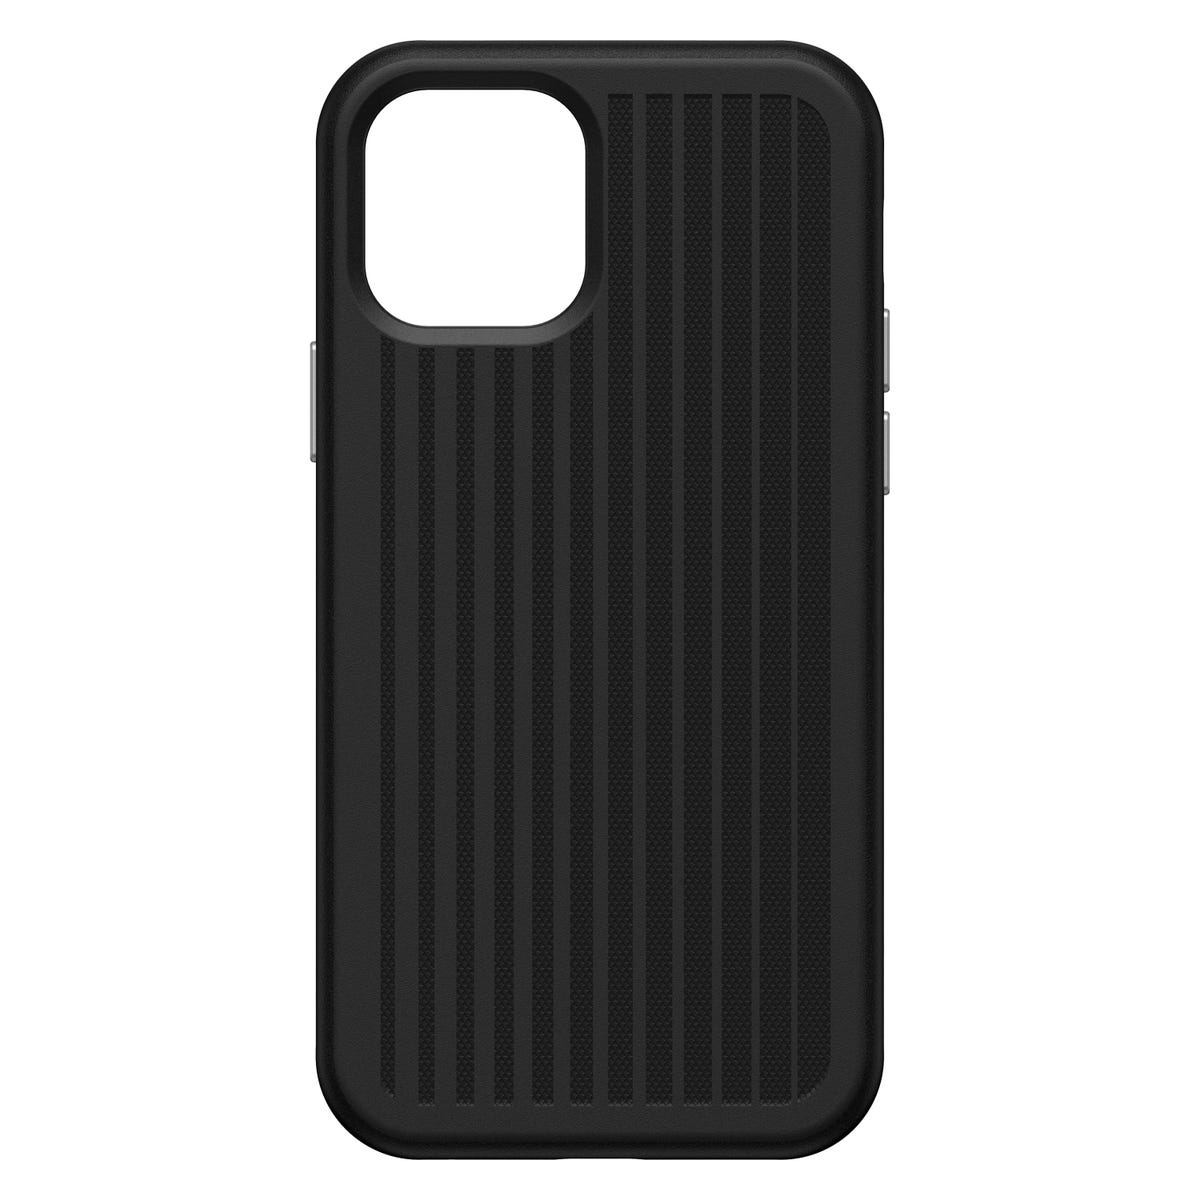 Otterbox gaming case iphone.jpg